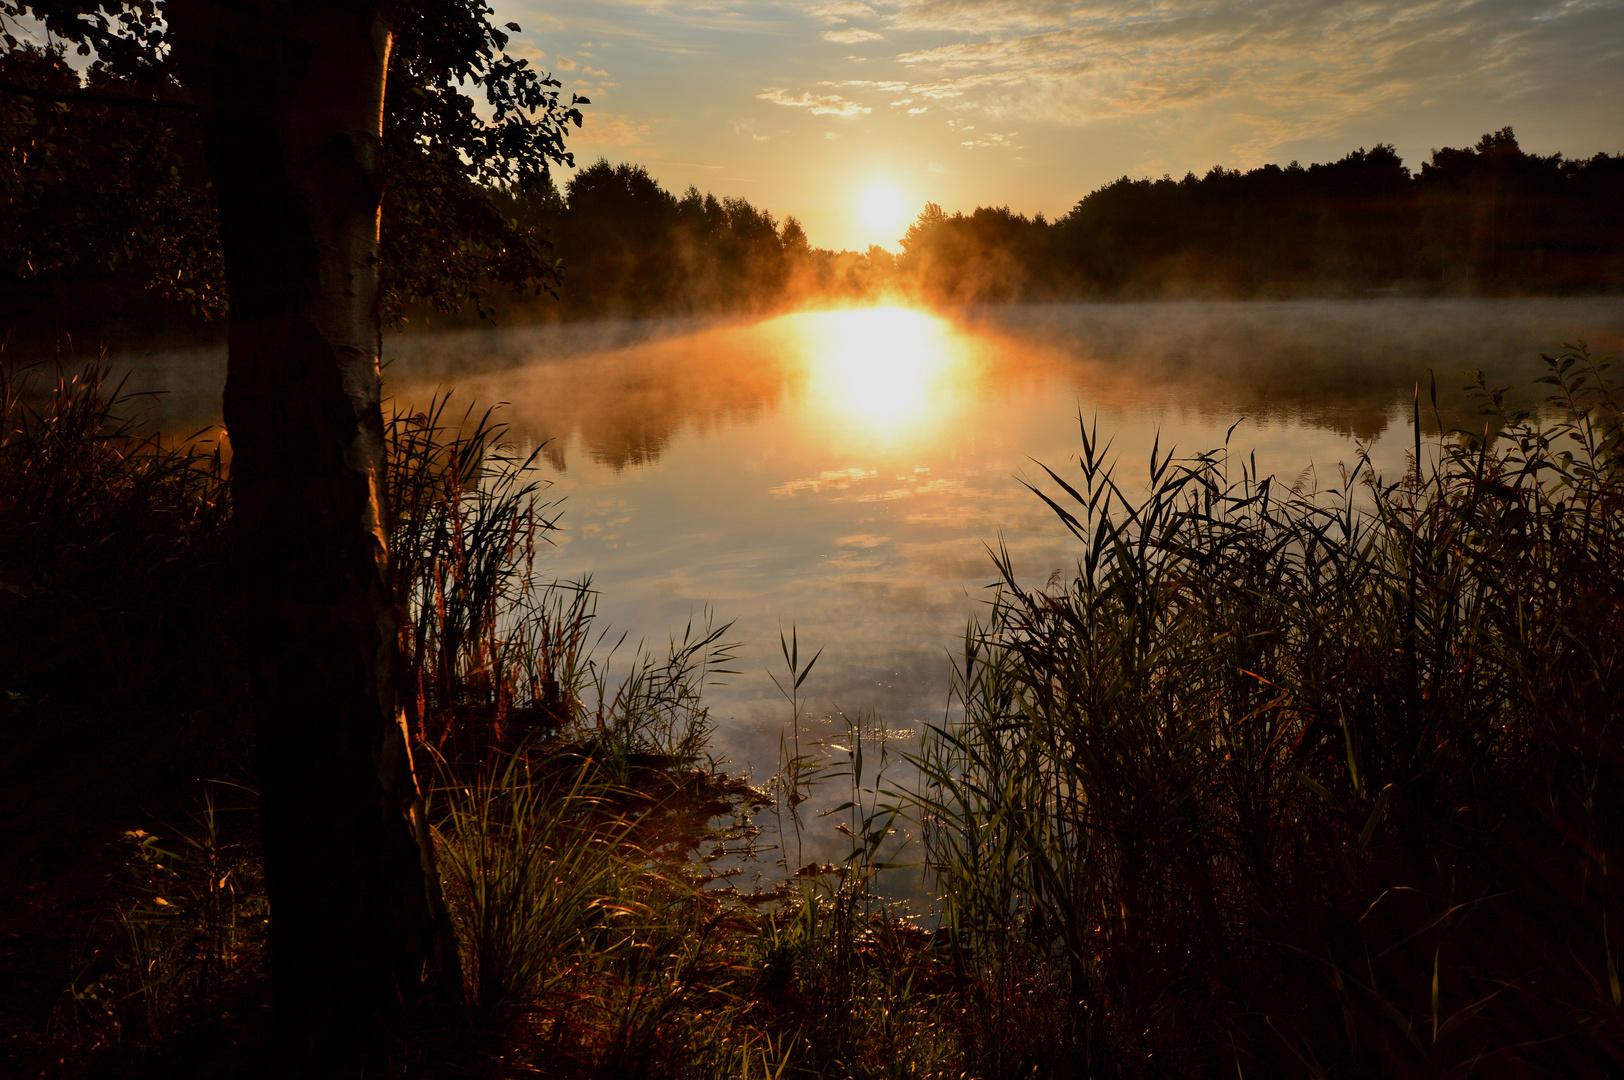 Sonne am frühen Morgen im September